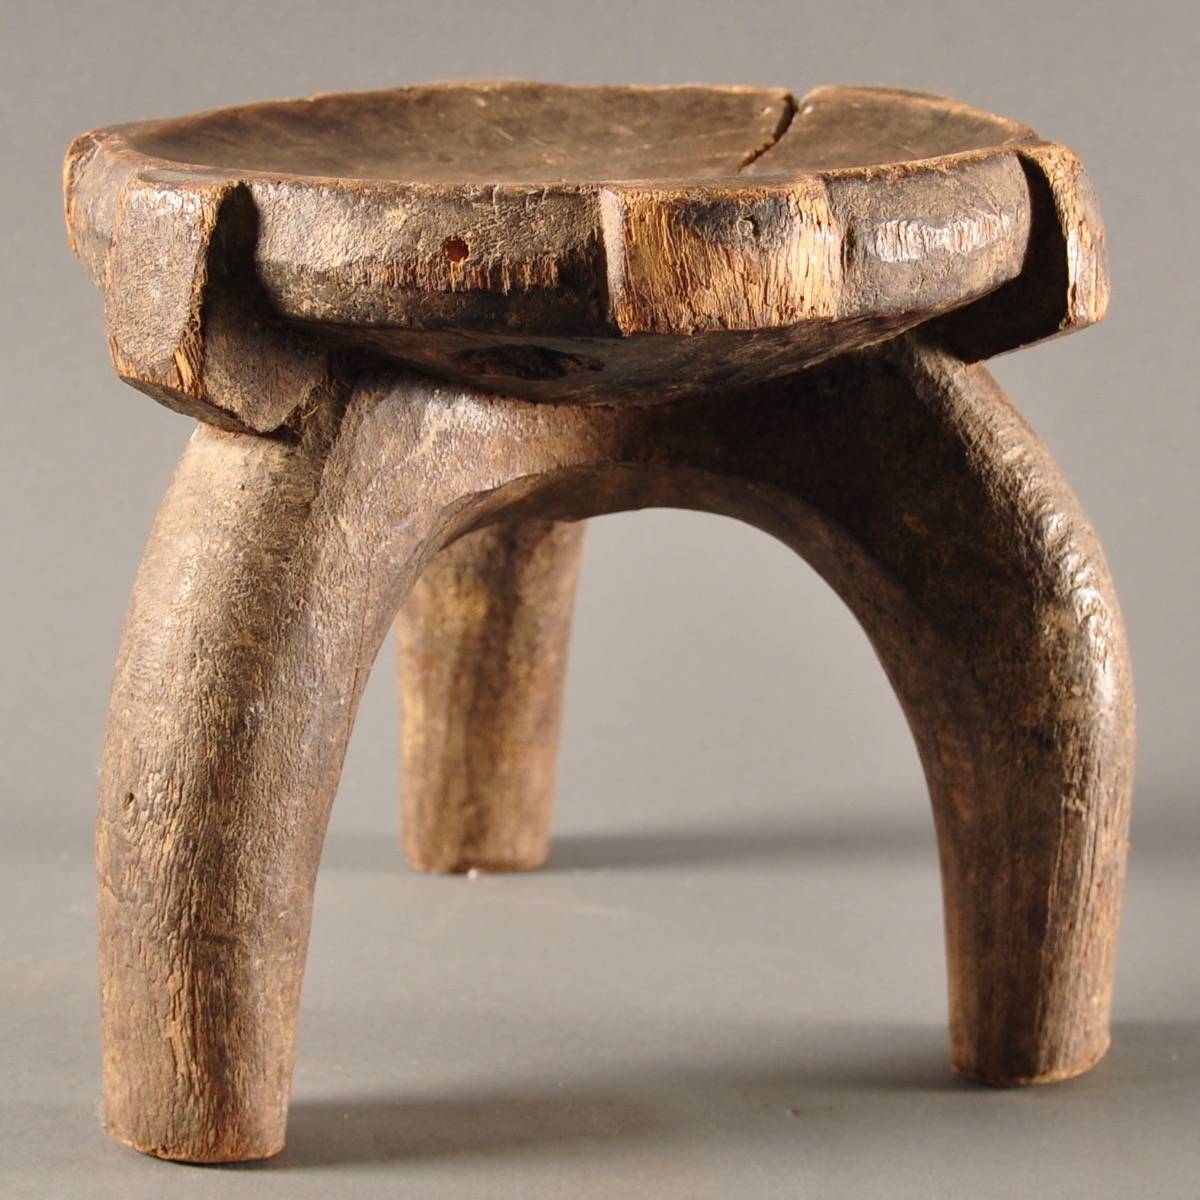 African Tribal Wooden Stool De Grande Antique Furniture